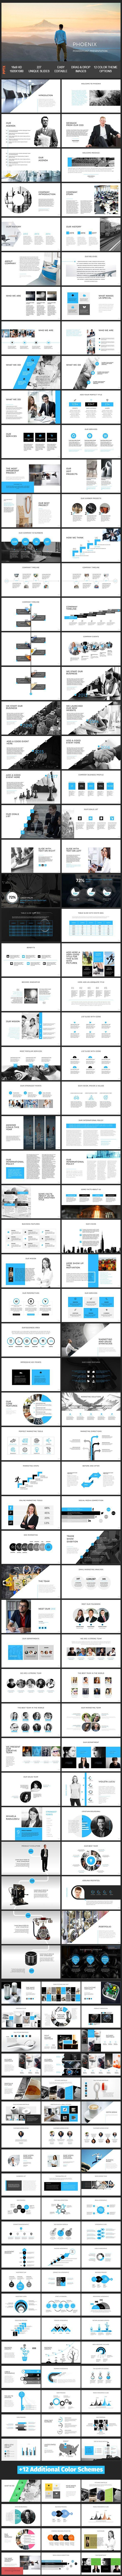 Phoenix - PowerPoint Presentation Template